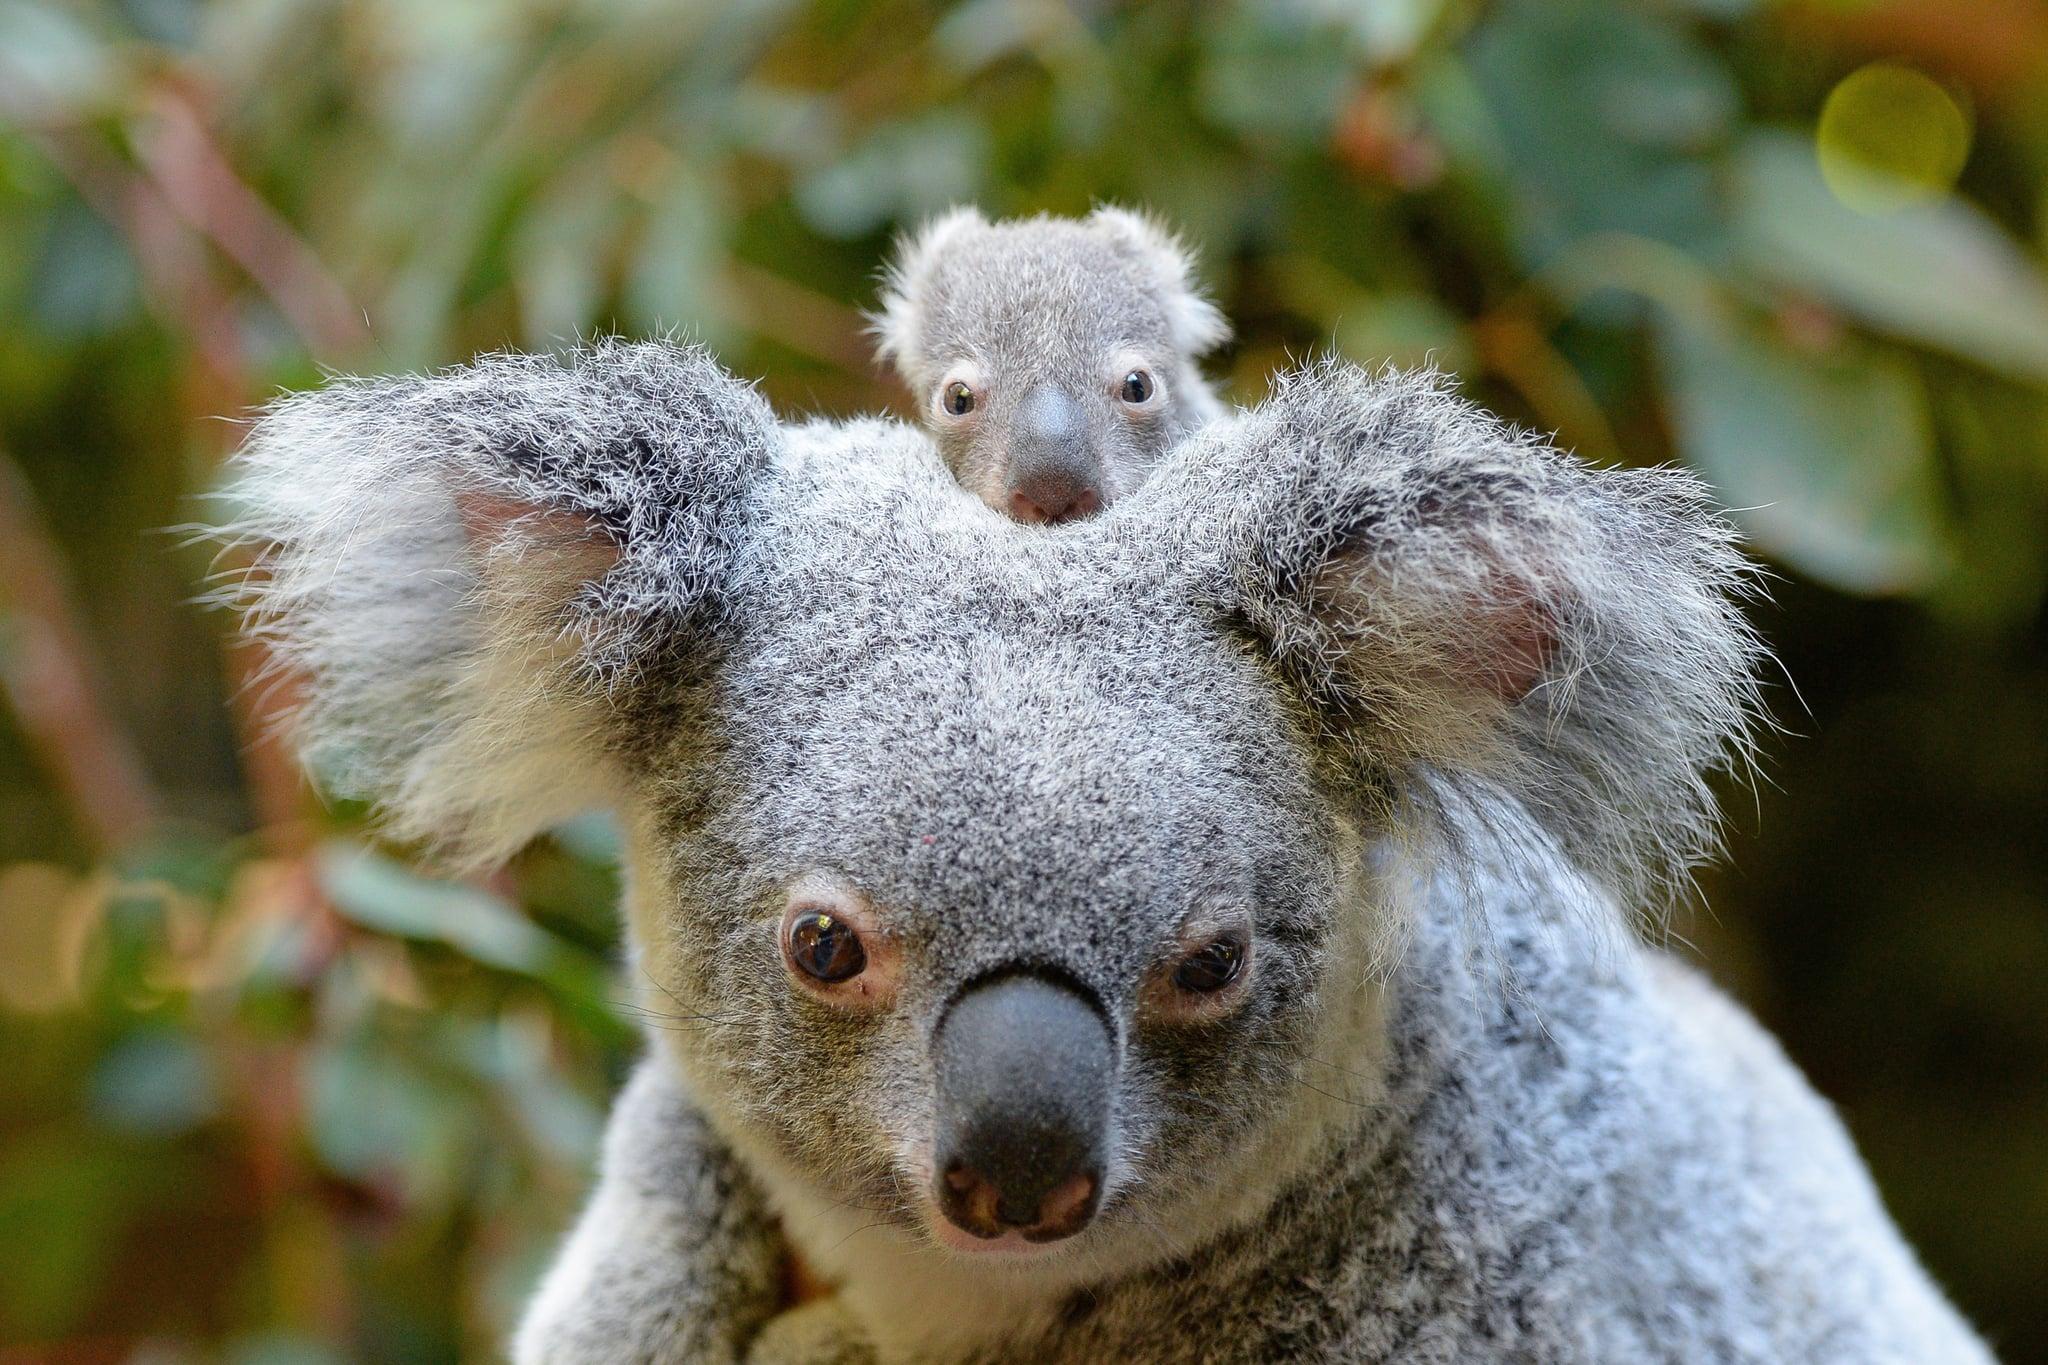 baby koala macadamia born at australia zoo 2017 popsugar australia news. Black Bedroom Furniture Sets. Home Design Ideas